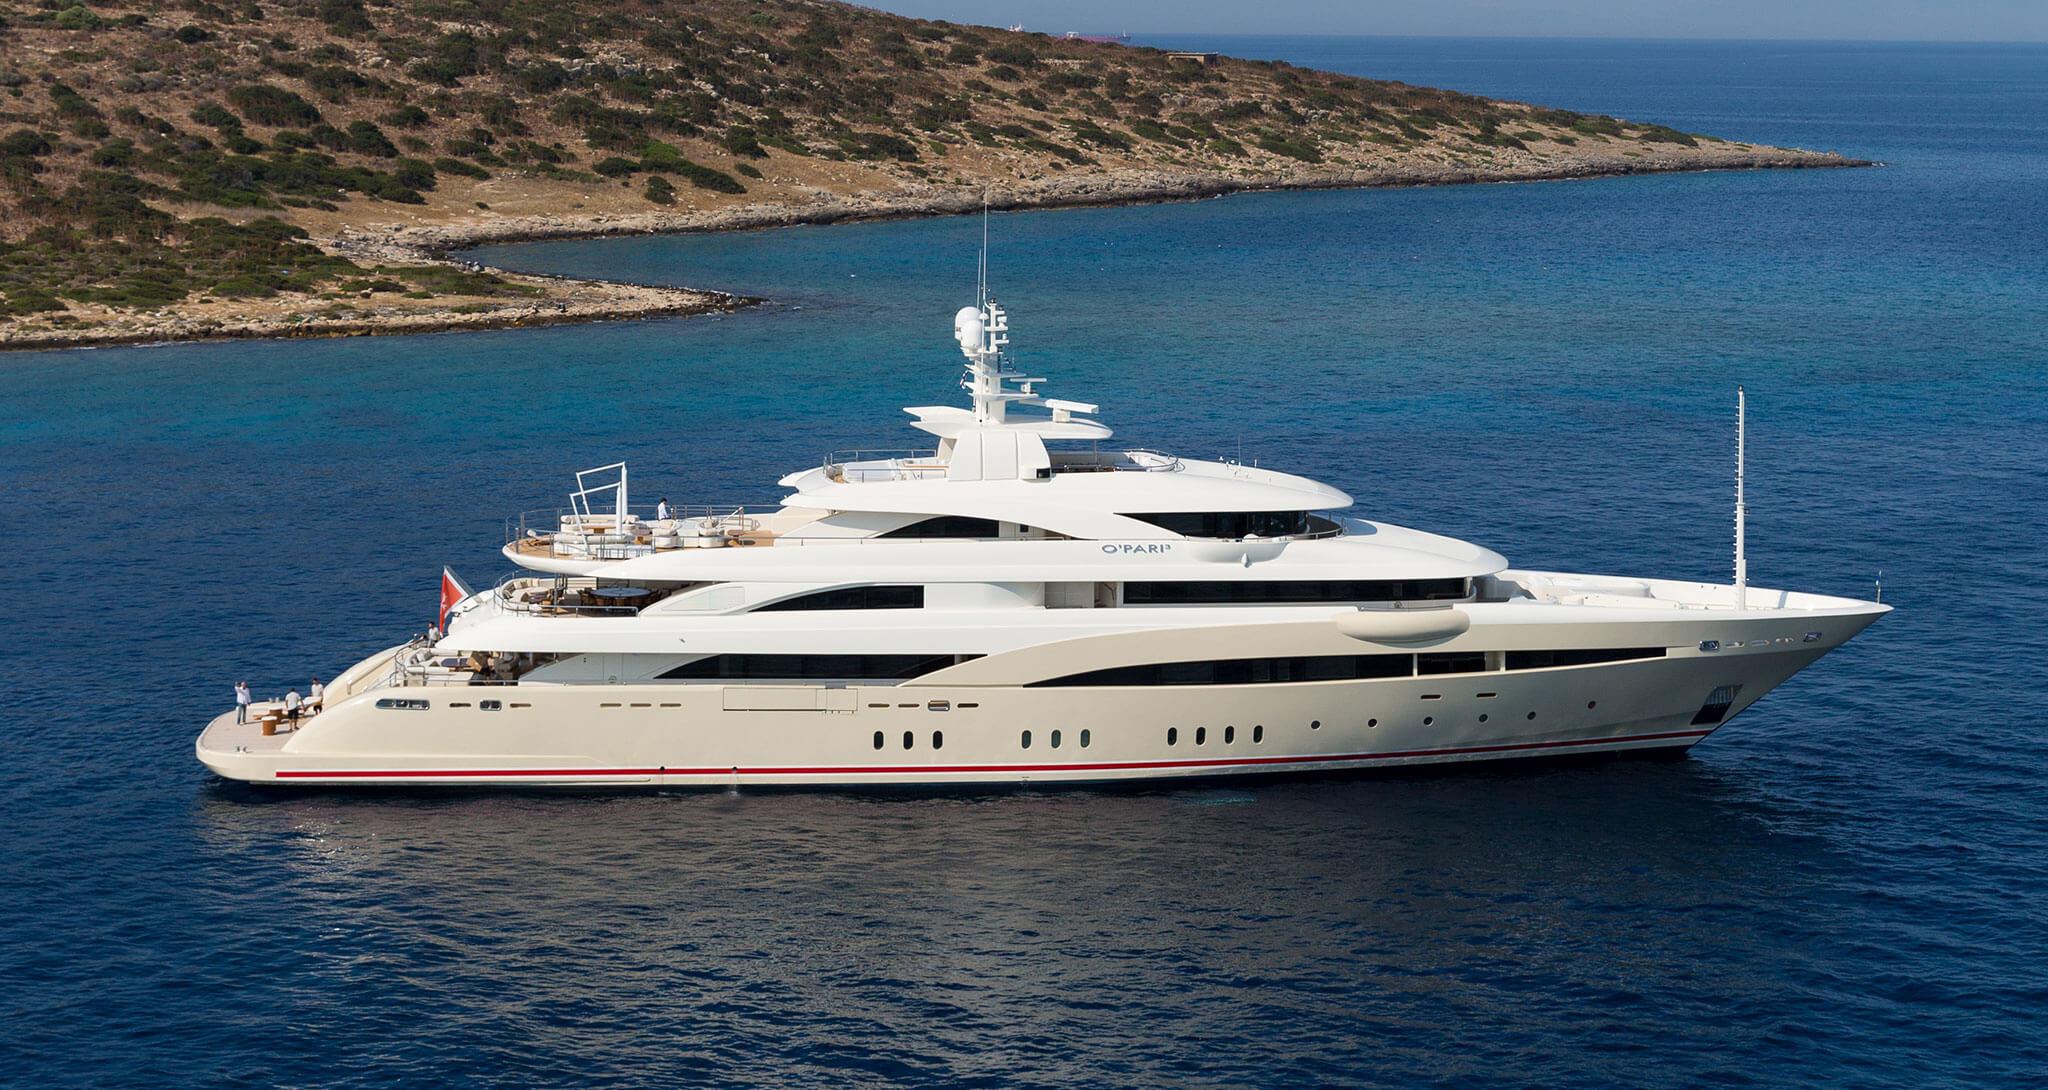 O Pari3 - Golden Yachts